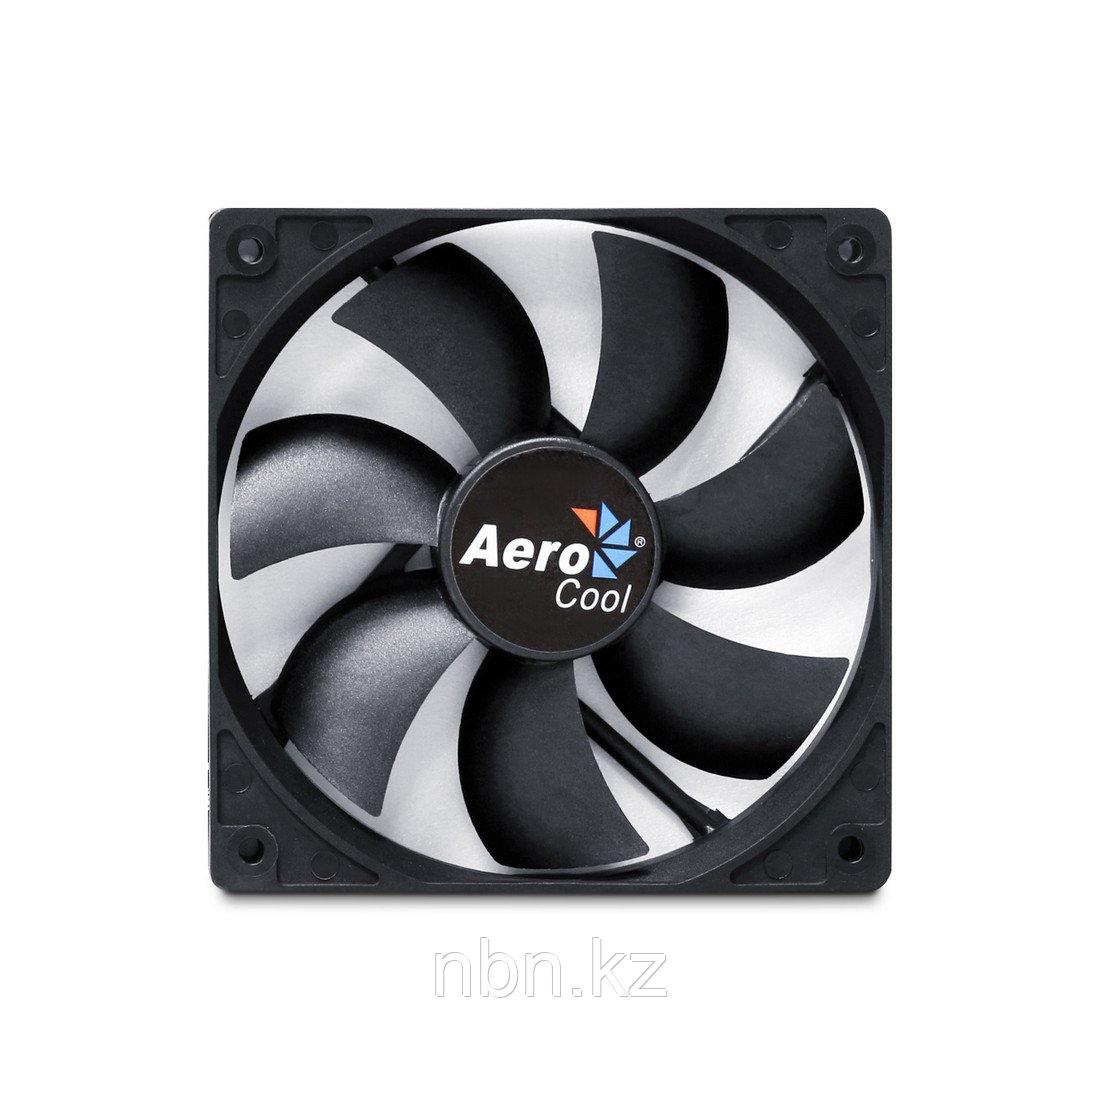 Кулер для компьютерного корпуса AeroCool 12см DARK FORCE Black